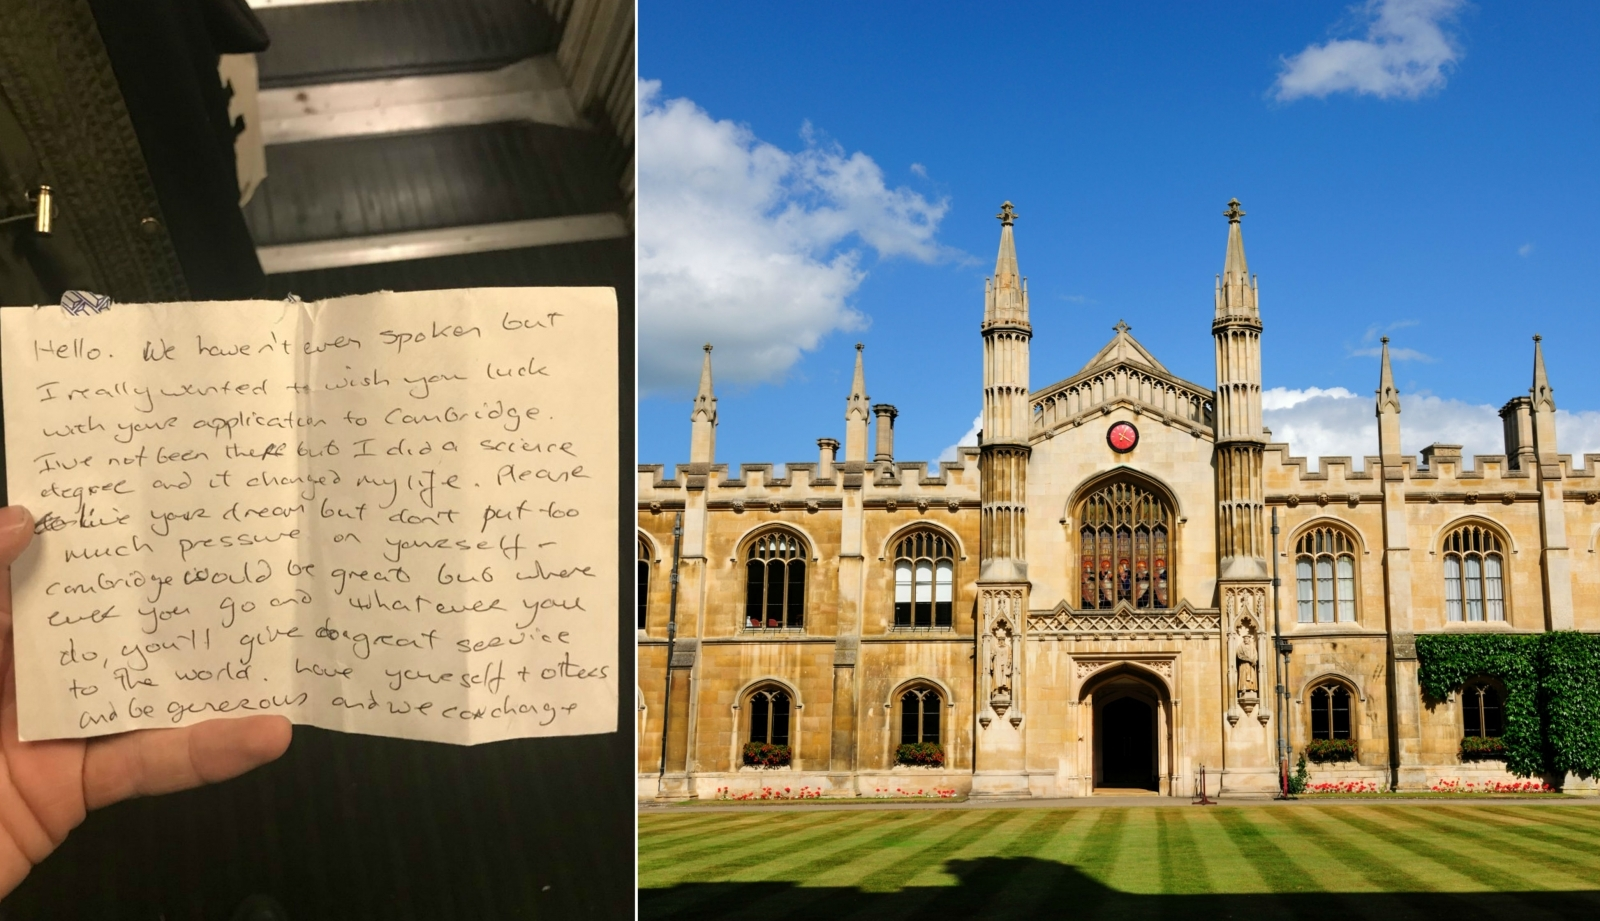 Cambridge University hearwarming note